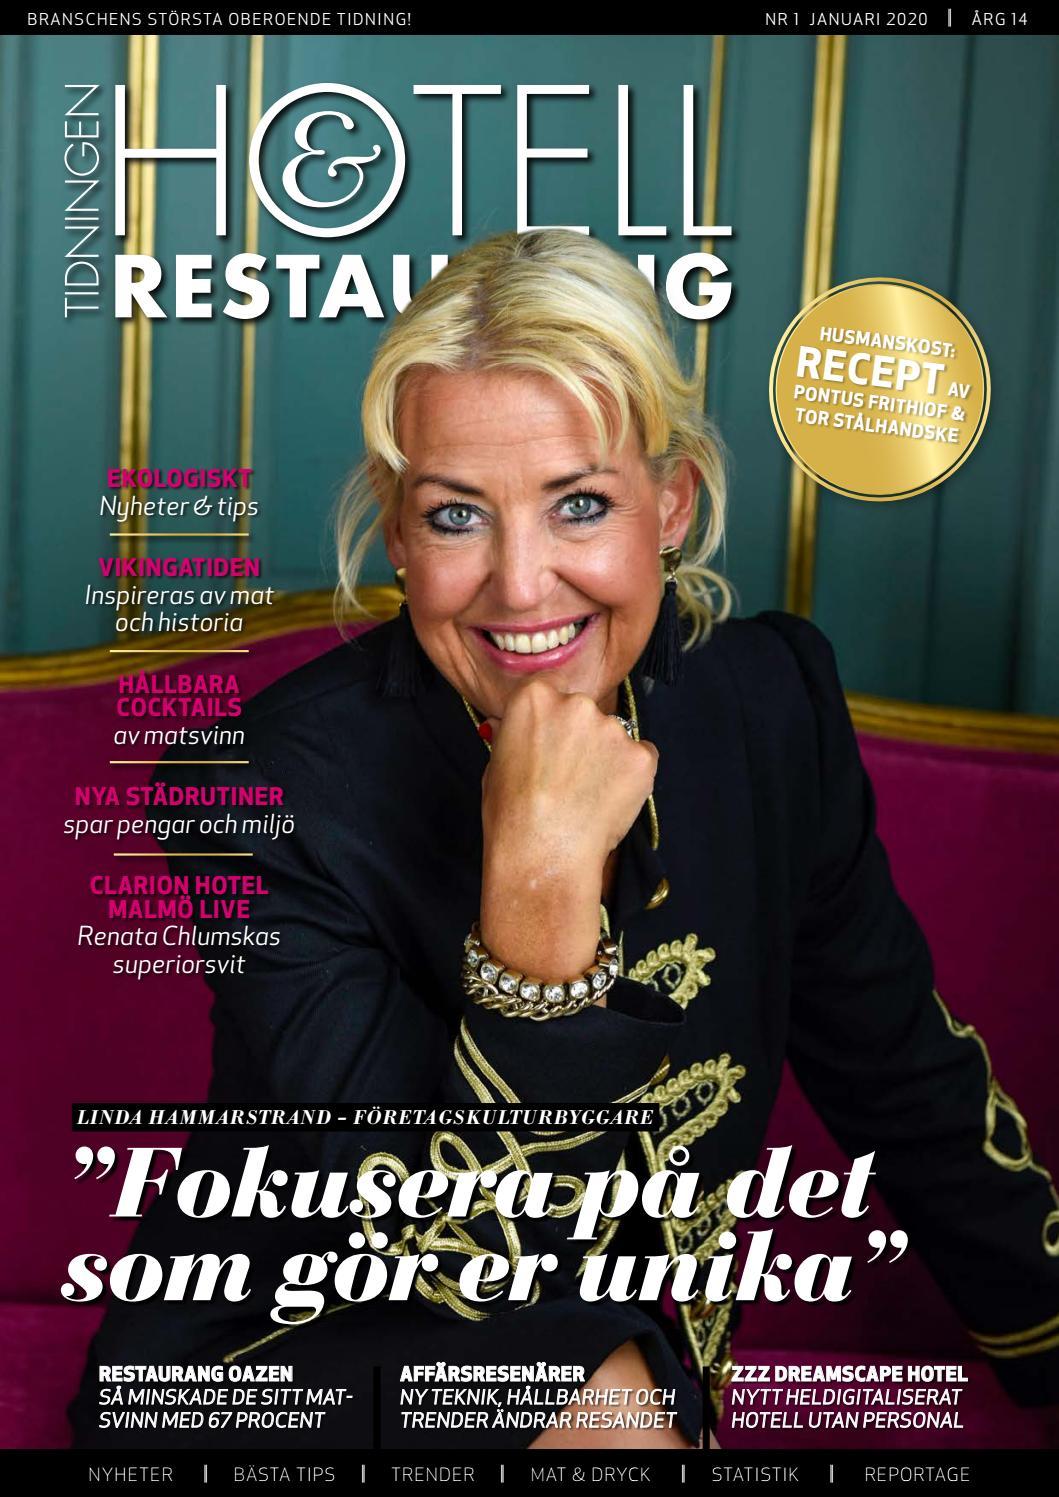 Sezgin Eren, Lilla Postegrdsgatan 7, Hisings Backa | satisfaction-survey.net